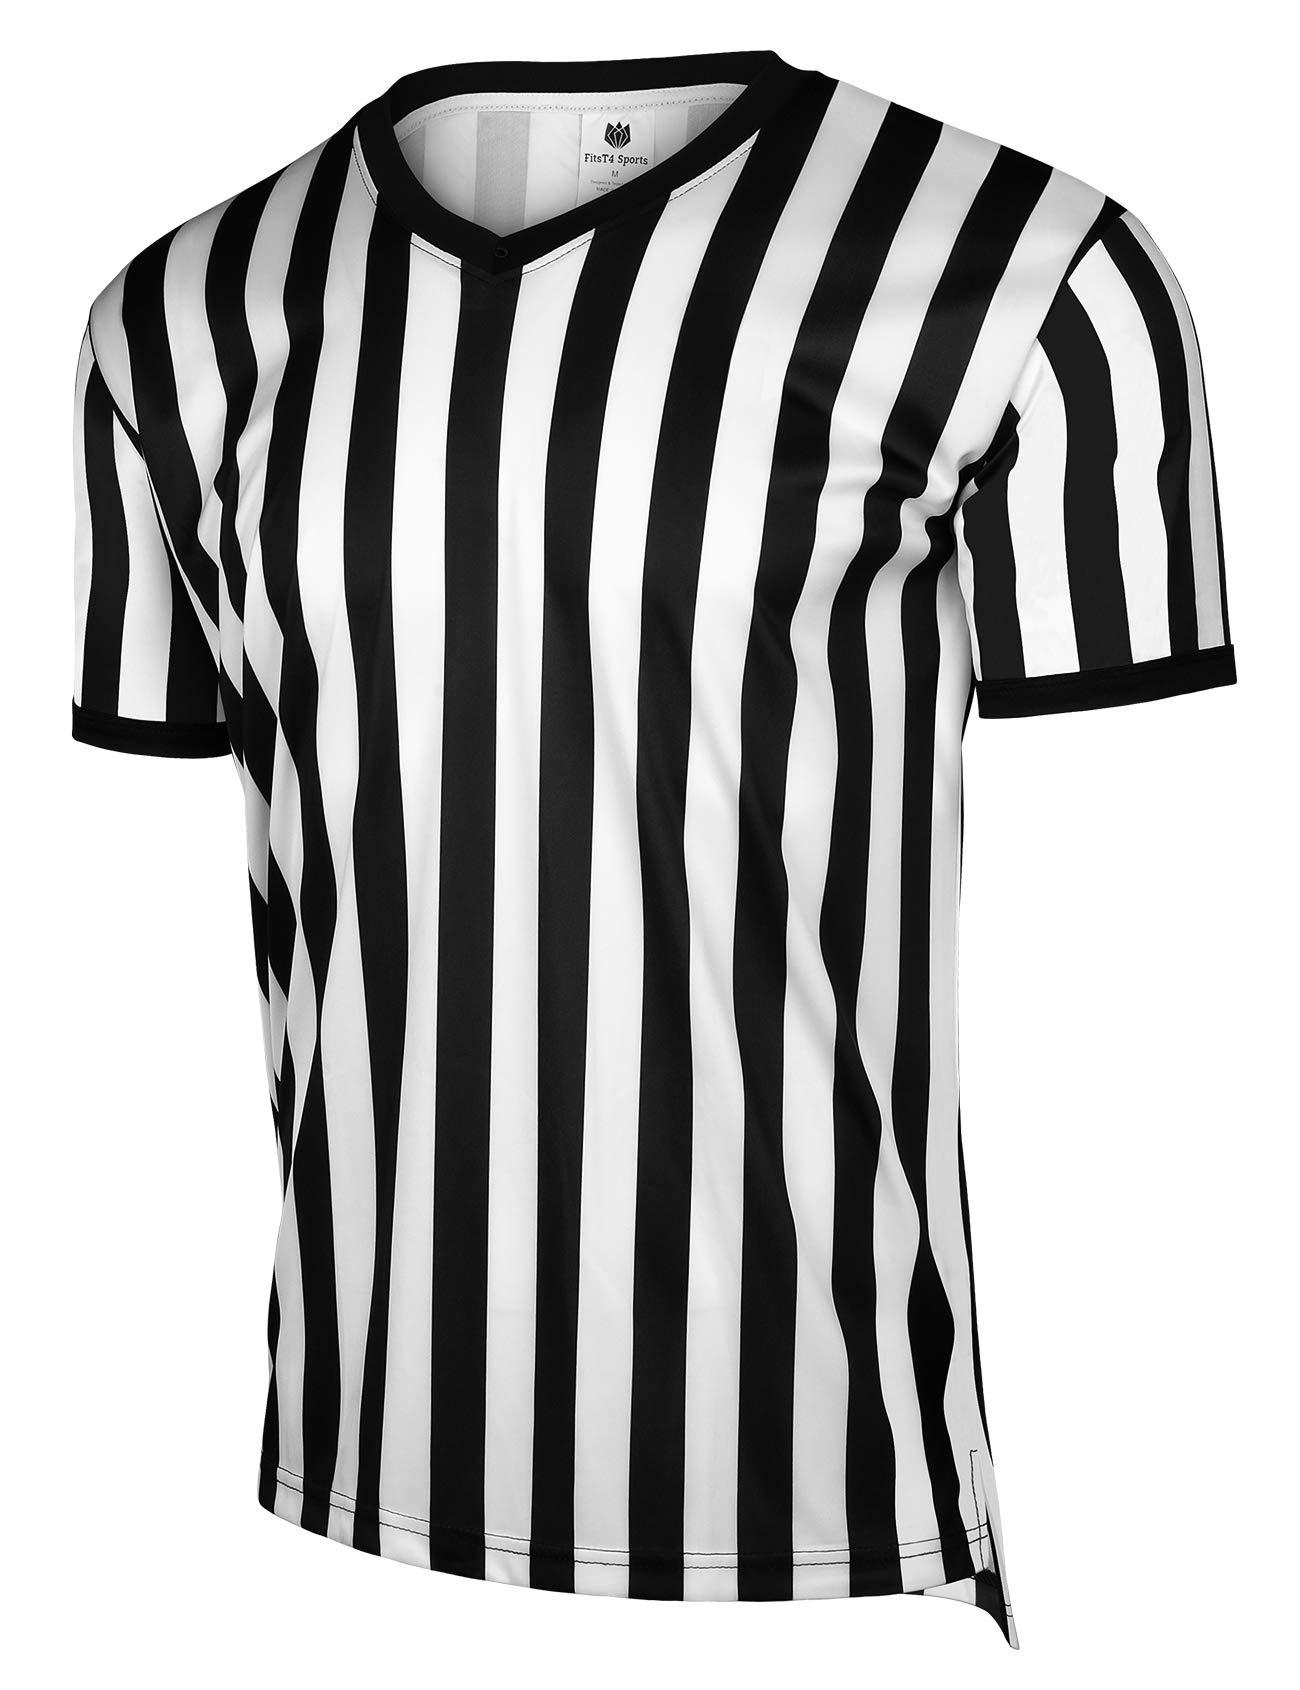 FitsT4 Men's Official Black & White Stripe Referee Shirt/Zipper Umpire Jerseys/Pro Ref Uniform for Soccer, Basketball & Football